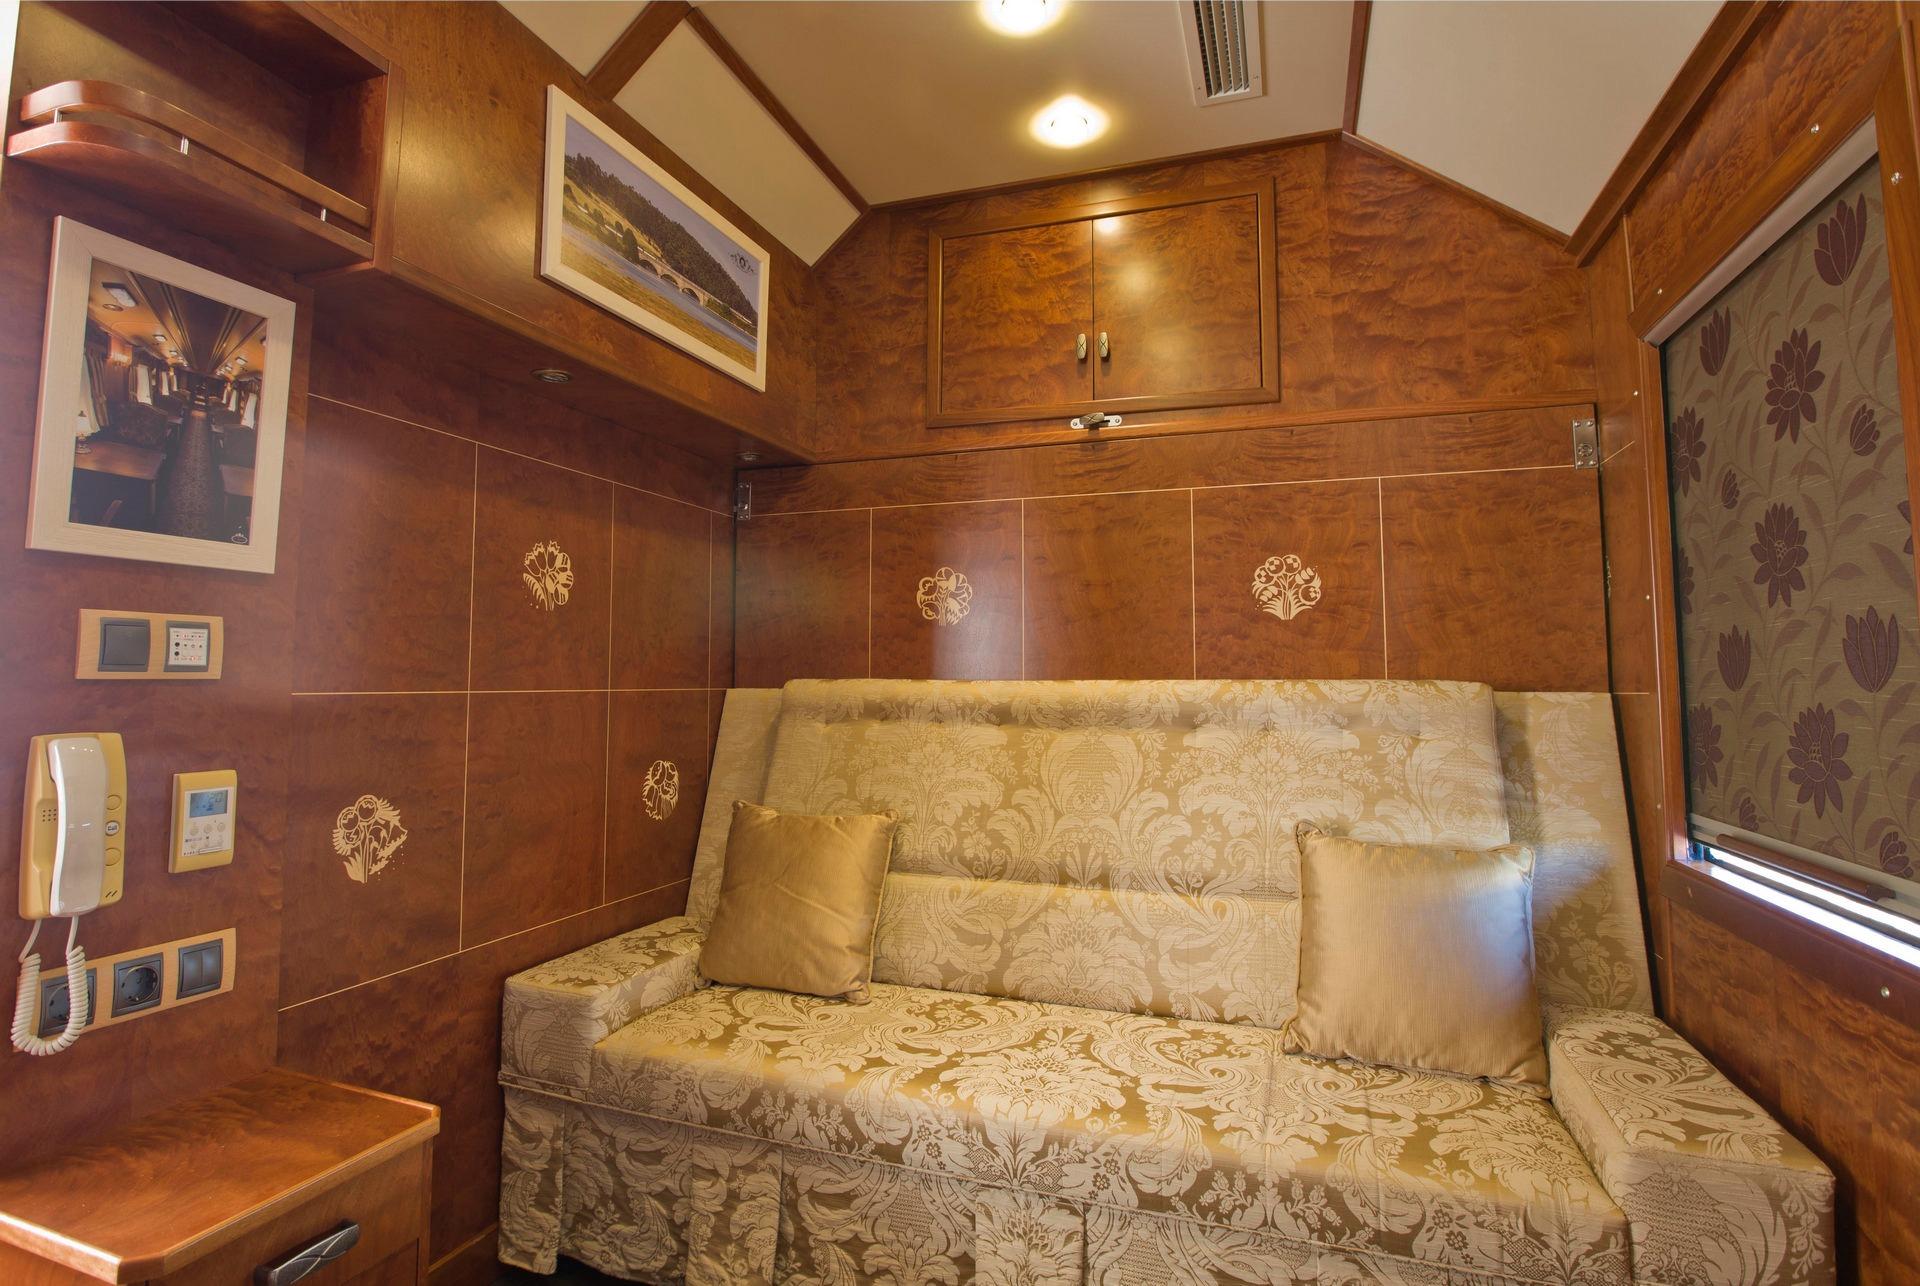 NOMAD-luksusowe-pociągi-w-Hiszpani-Al-Andalus-08